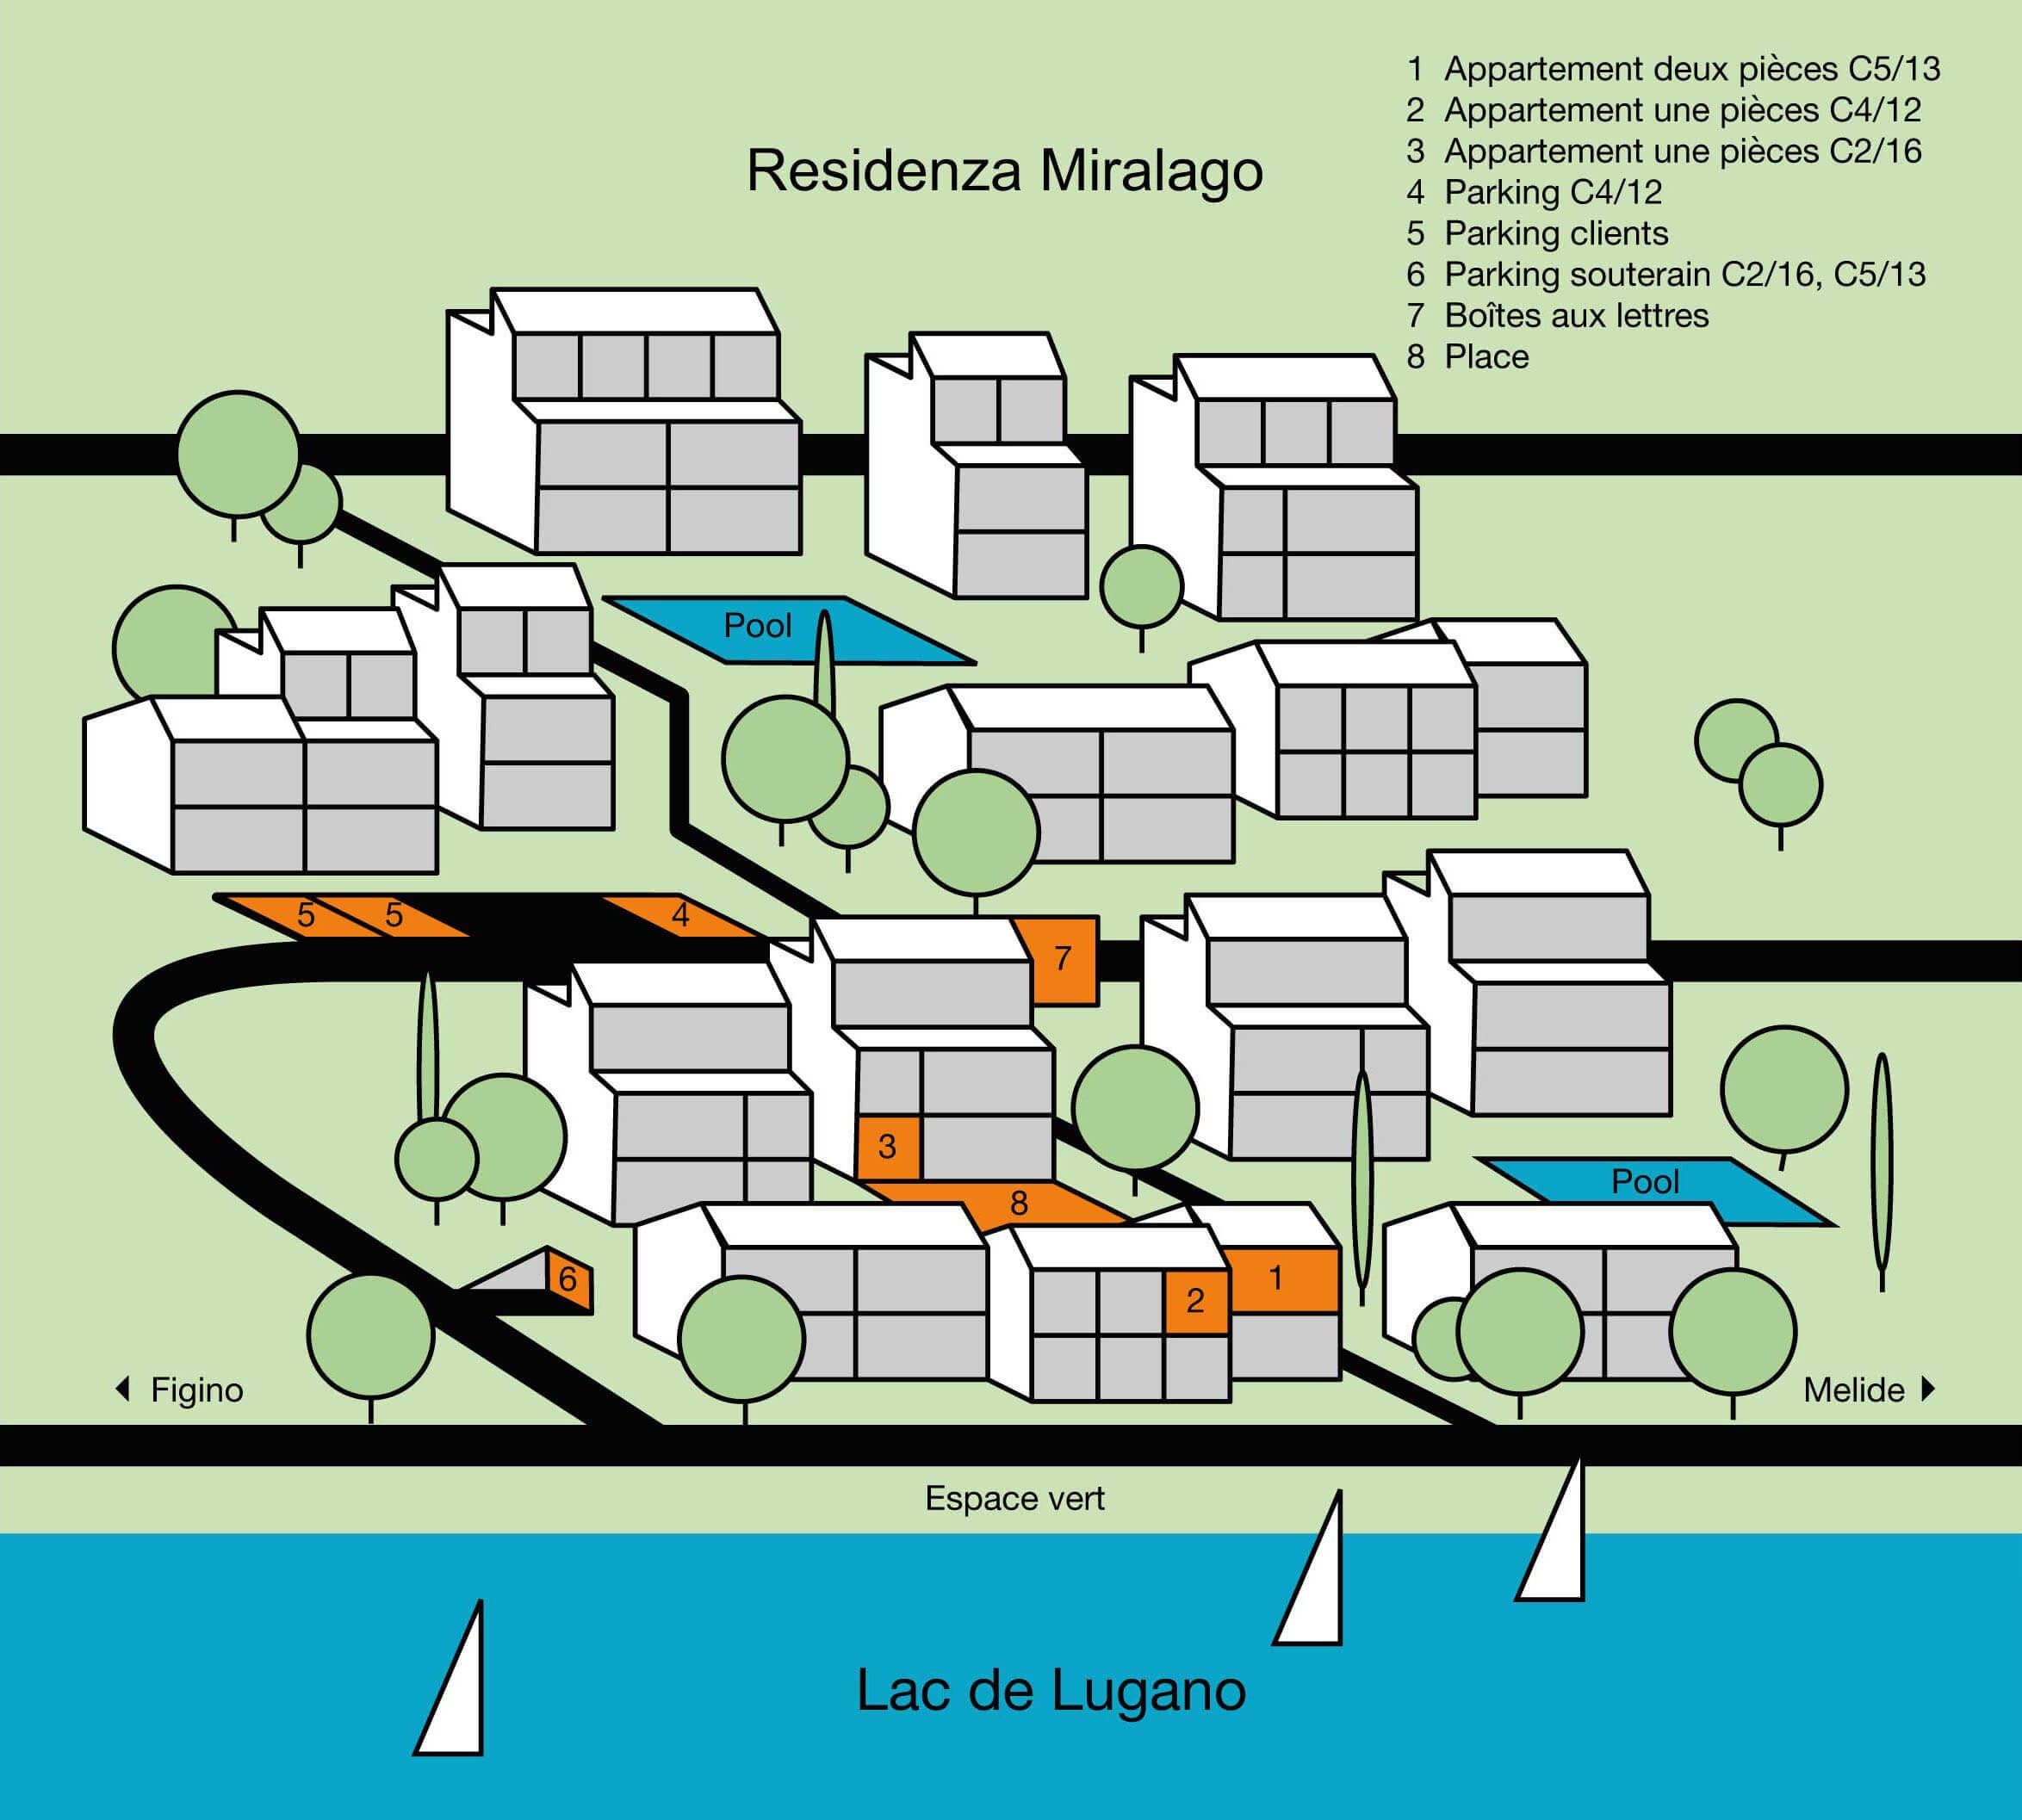 Ce plan montre la Residenza Miralago.